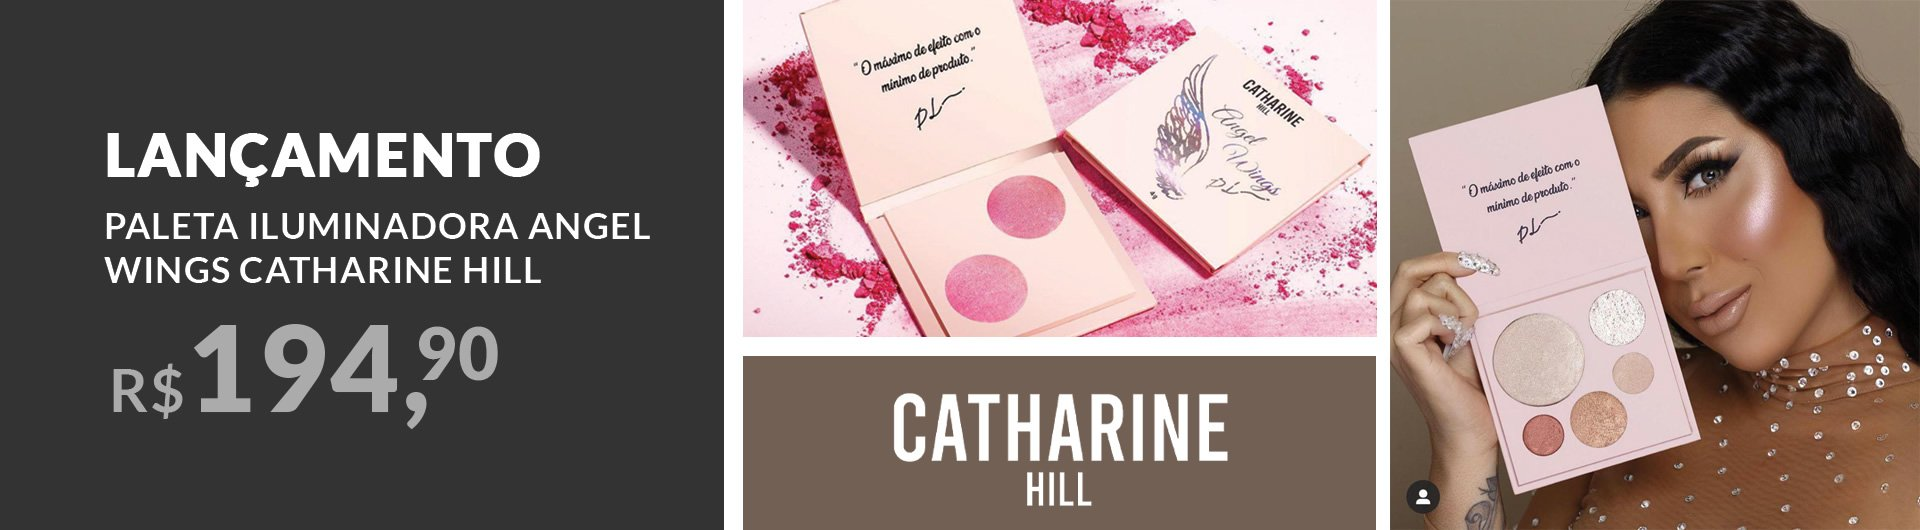 Lançamento Paleta de Iluminador Catharine Hill Angel Wings Pri Lessa 19g